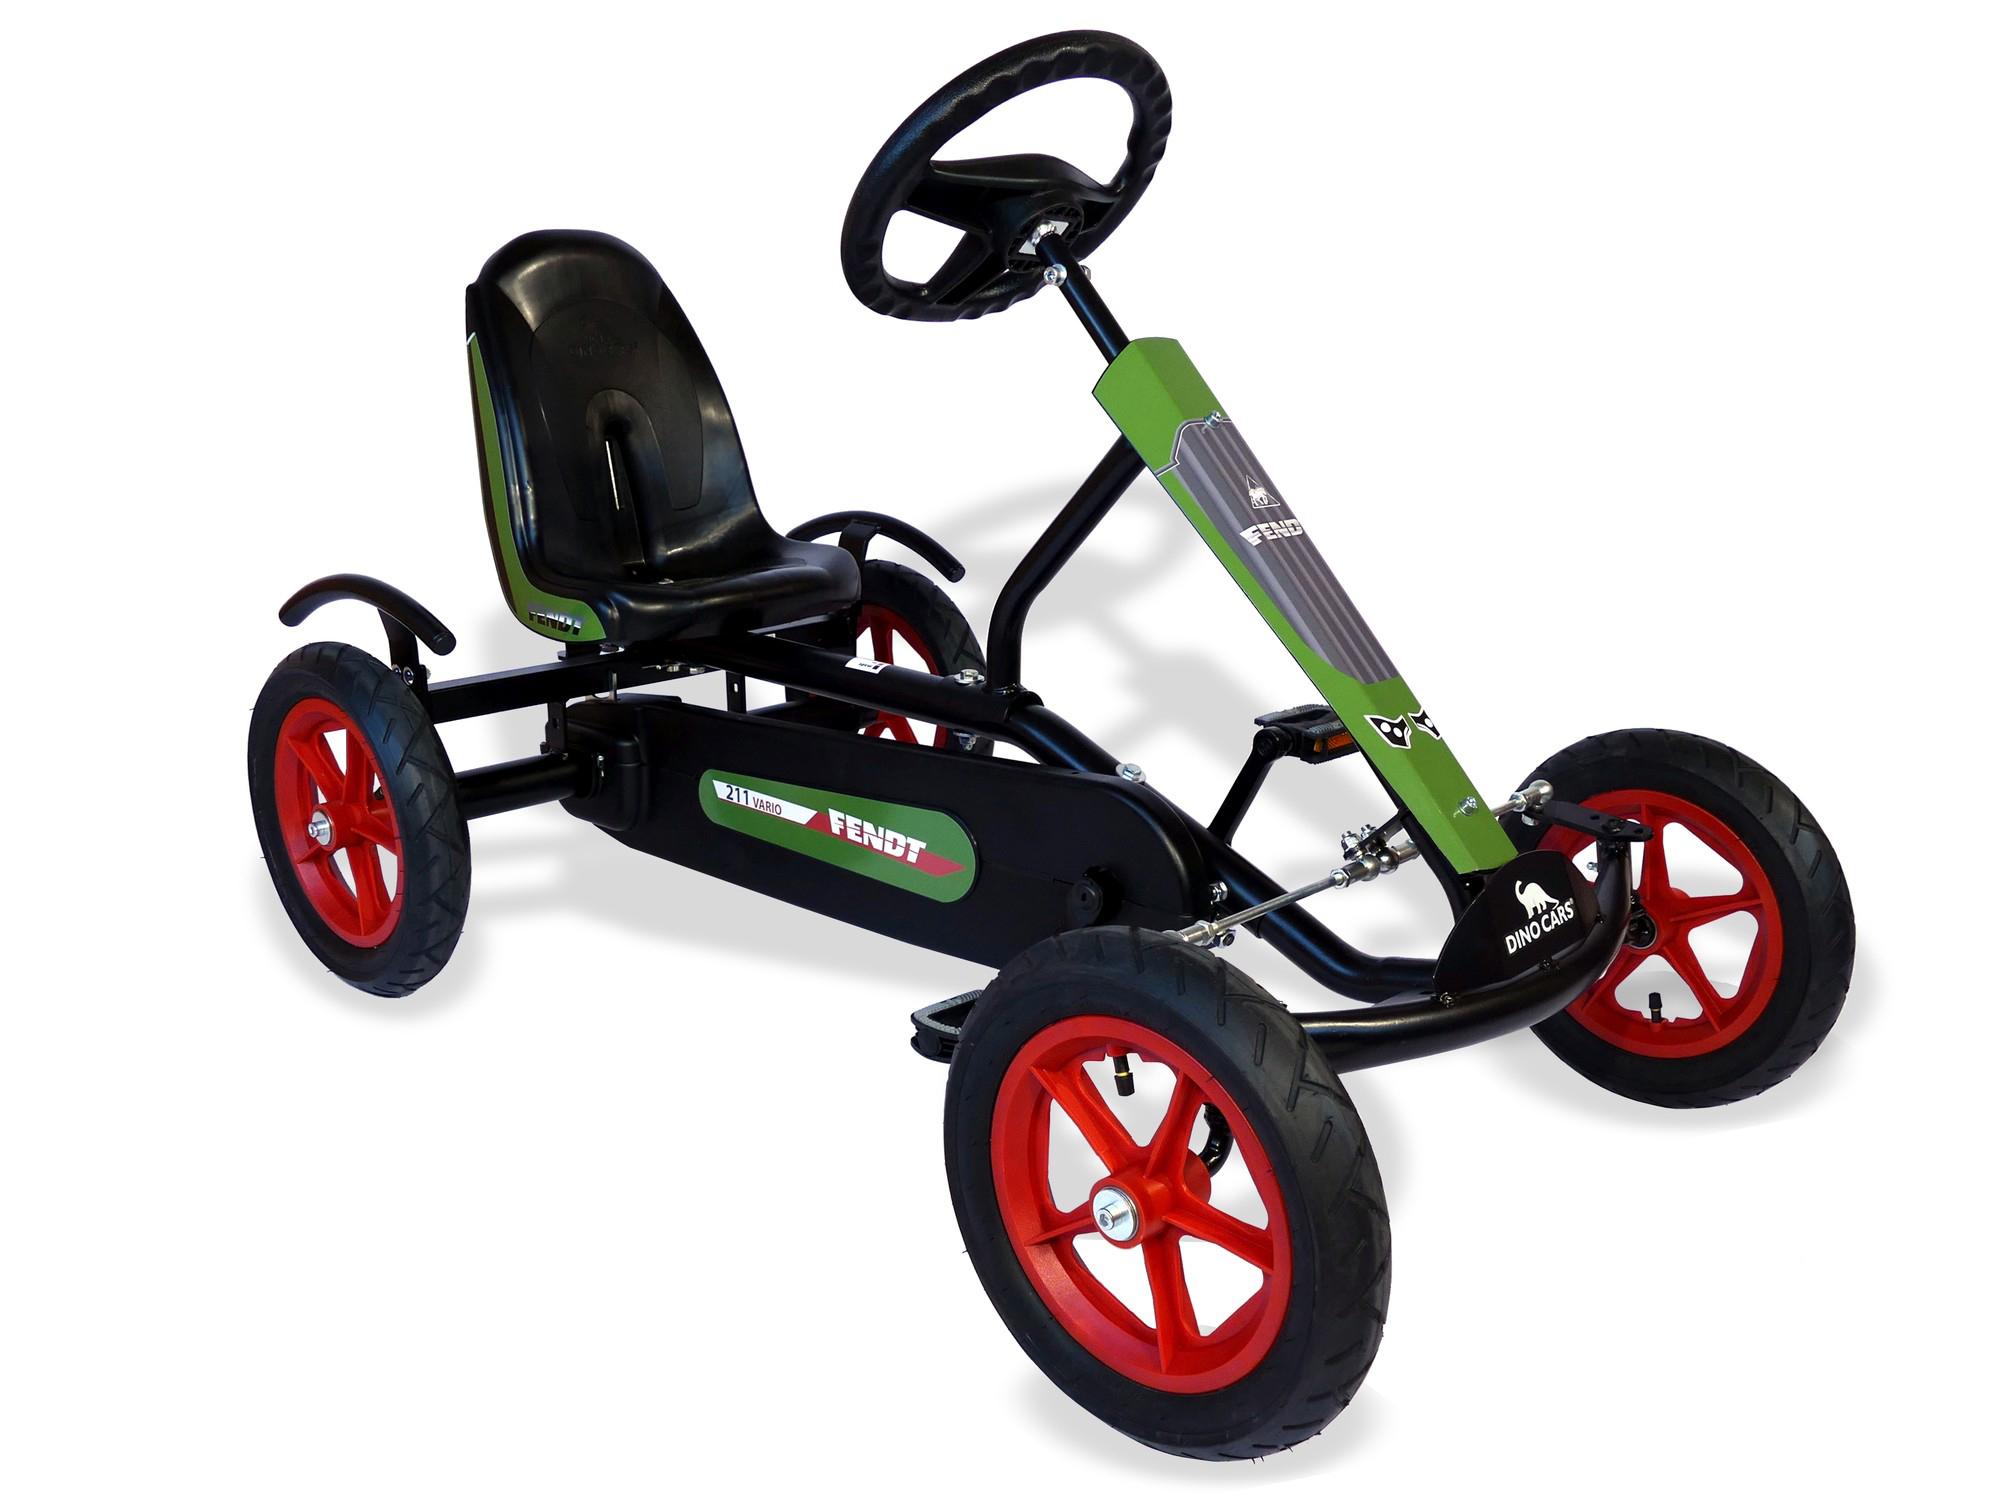 Gokart / Pedal-Gokart Kids Speedy Fendt BF1 DINO CARS Bild 1